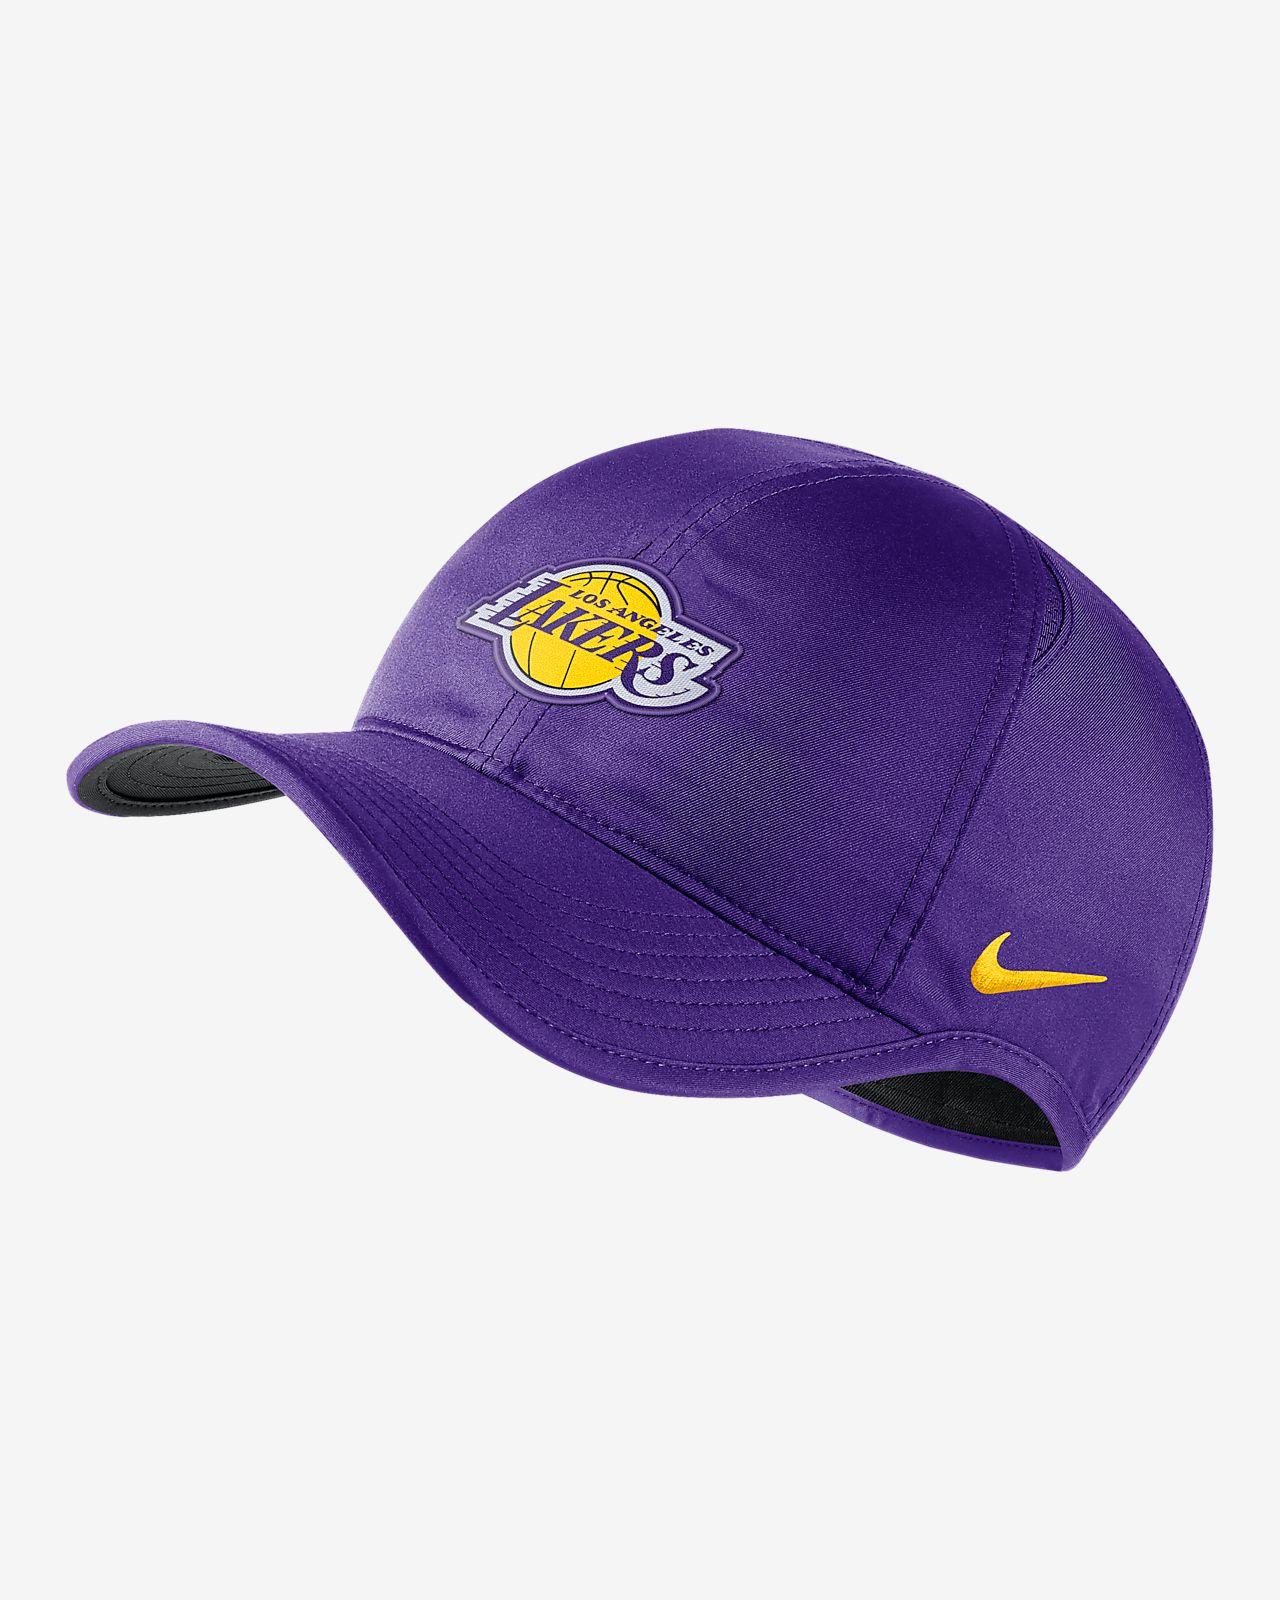 Los Angeles Lakers Nike AeroBill Featherlight NBA 帽款